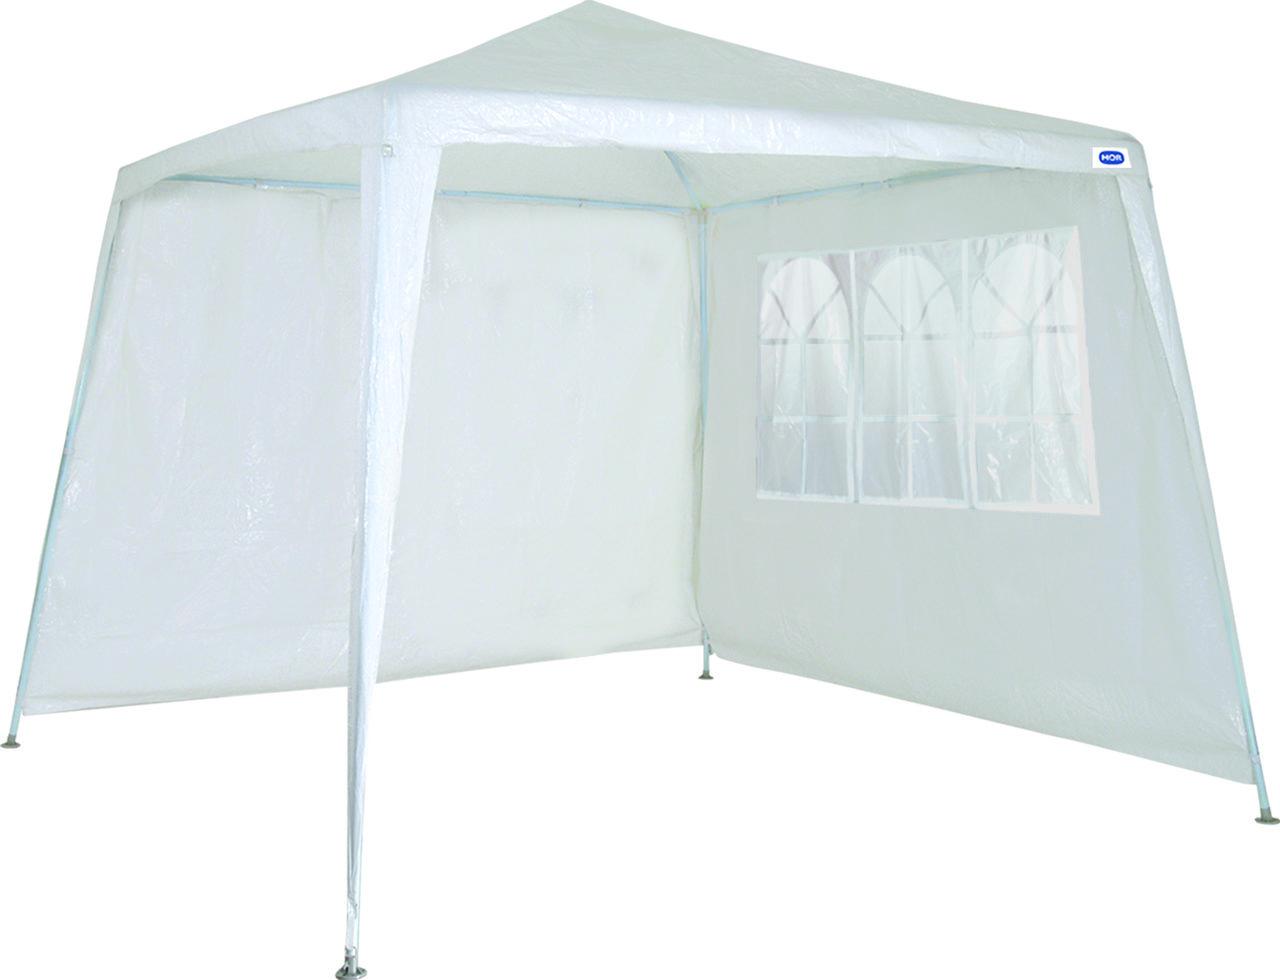 Conjunto Parede Para Gazebo 2,4m x 3m Ráfia Branco MOR - 003540